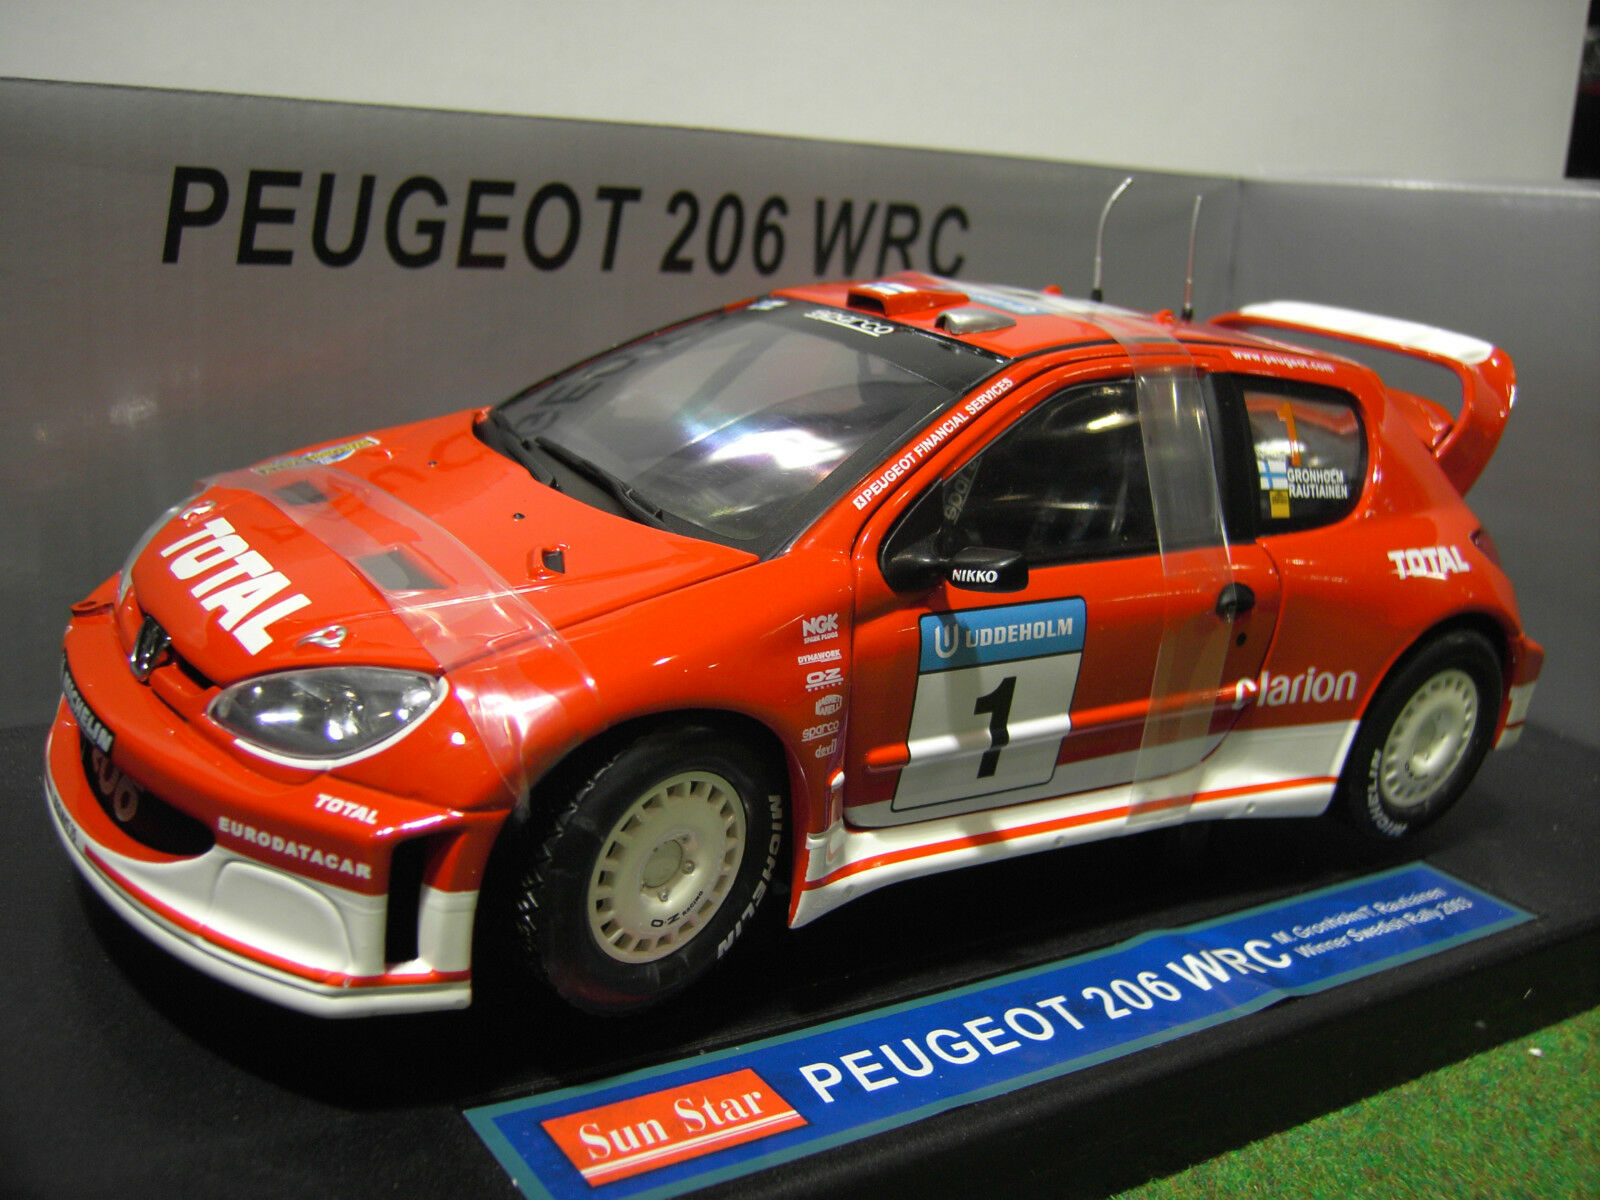 PEUGEOT PEUGEOT PEUGEOT  206 WRC RtuttiY 2003 SWEDISH 1 18 SUNestrella SUN estrella 3860 voiture miniature b53179